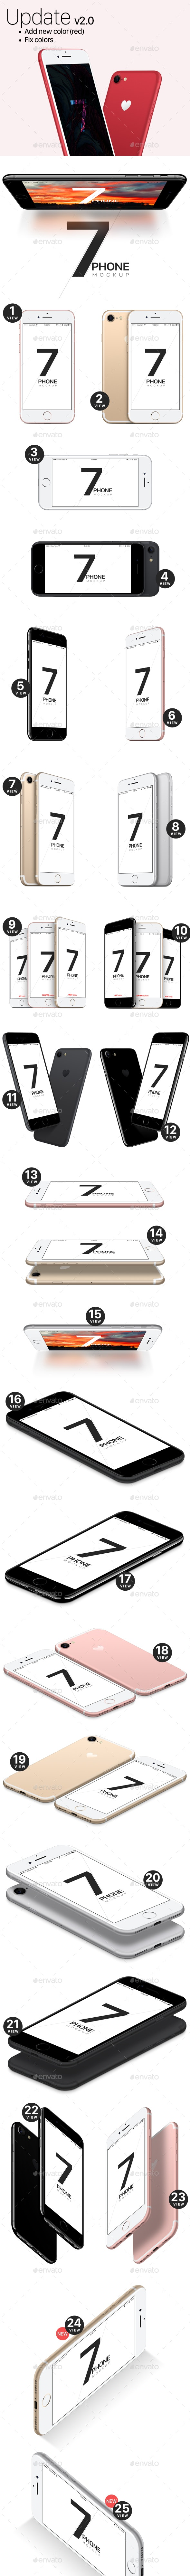 Phone 7 and 7 Plus Vector Mockups - Mobile Displays